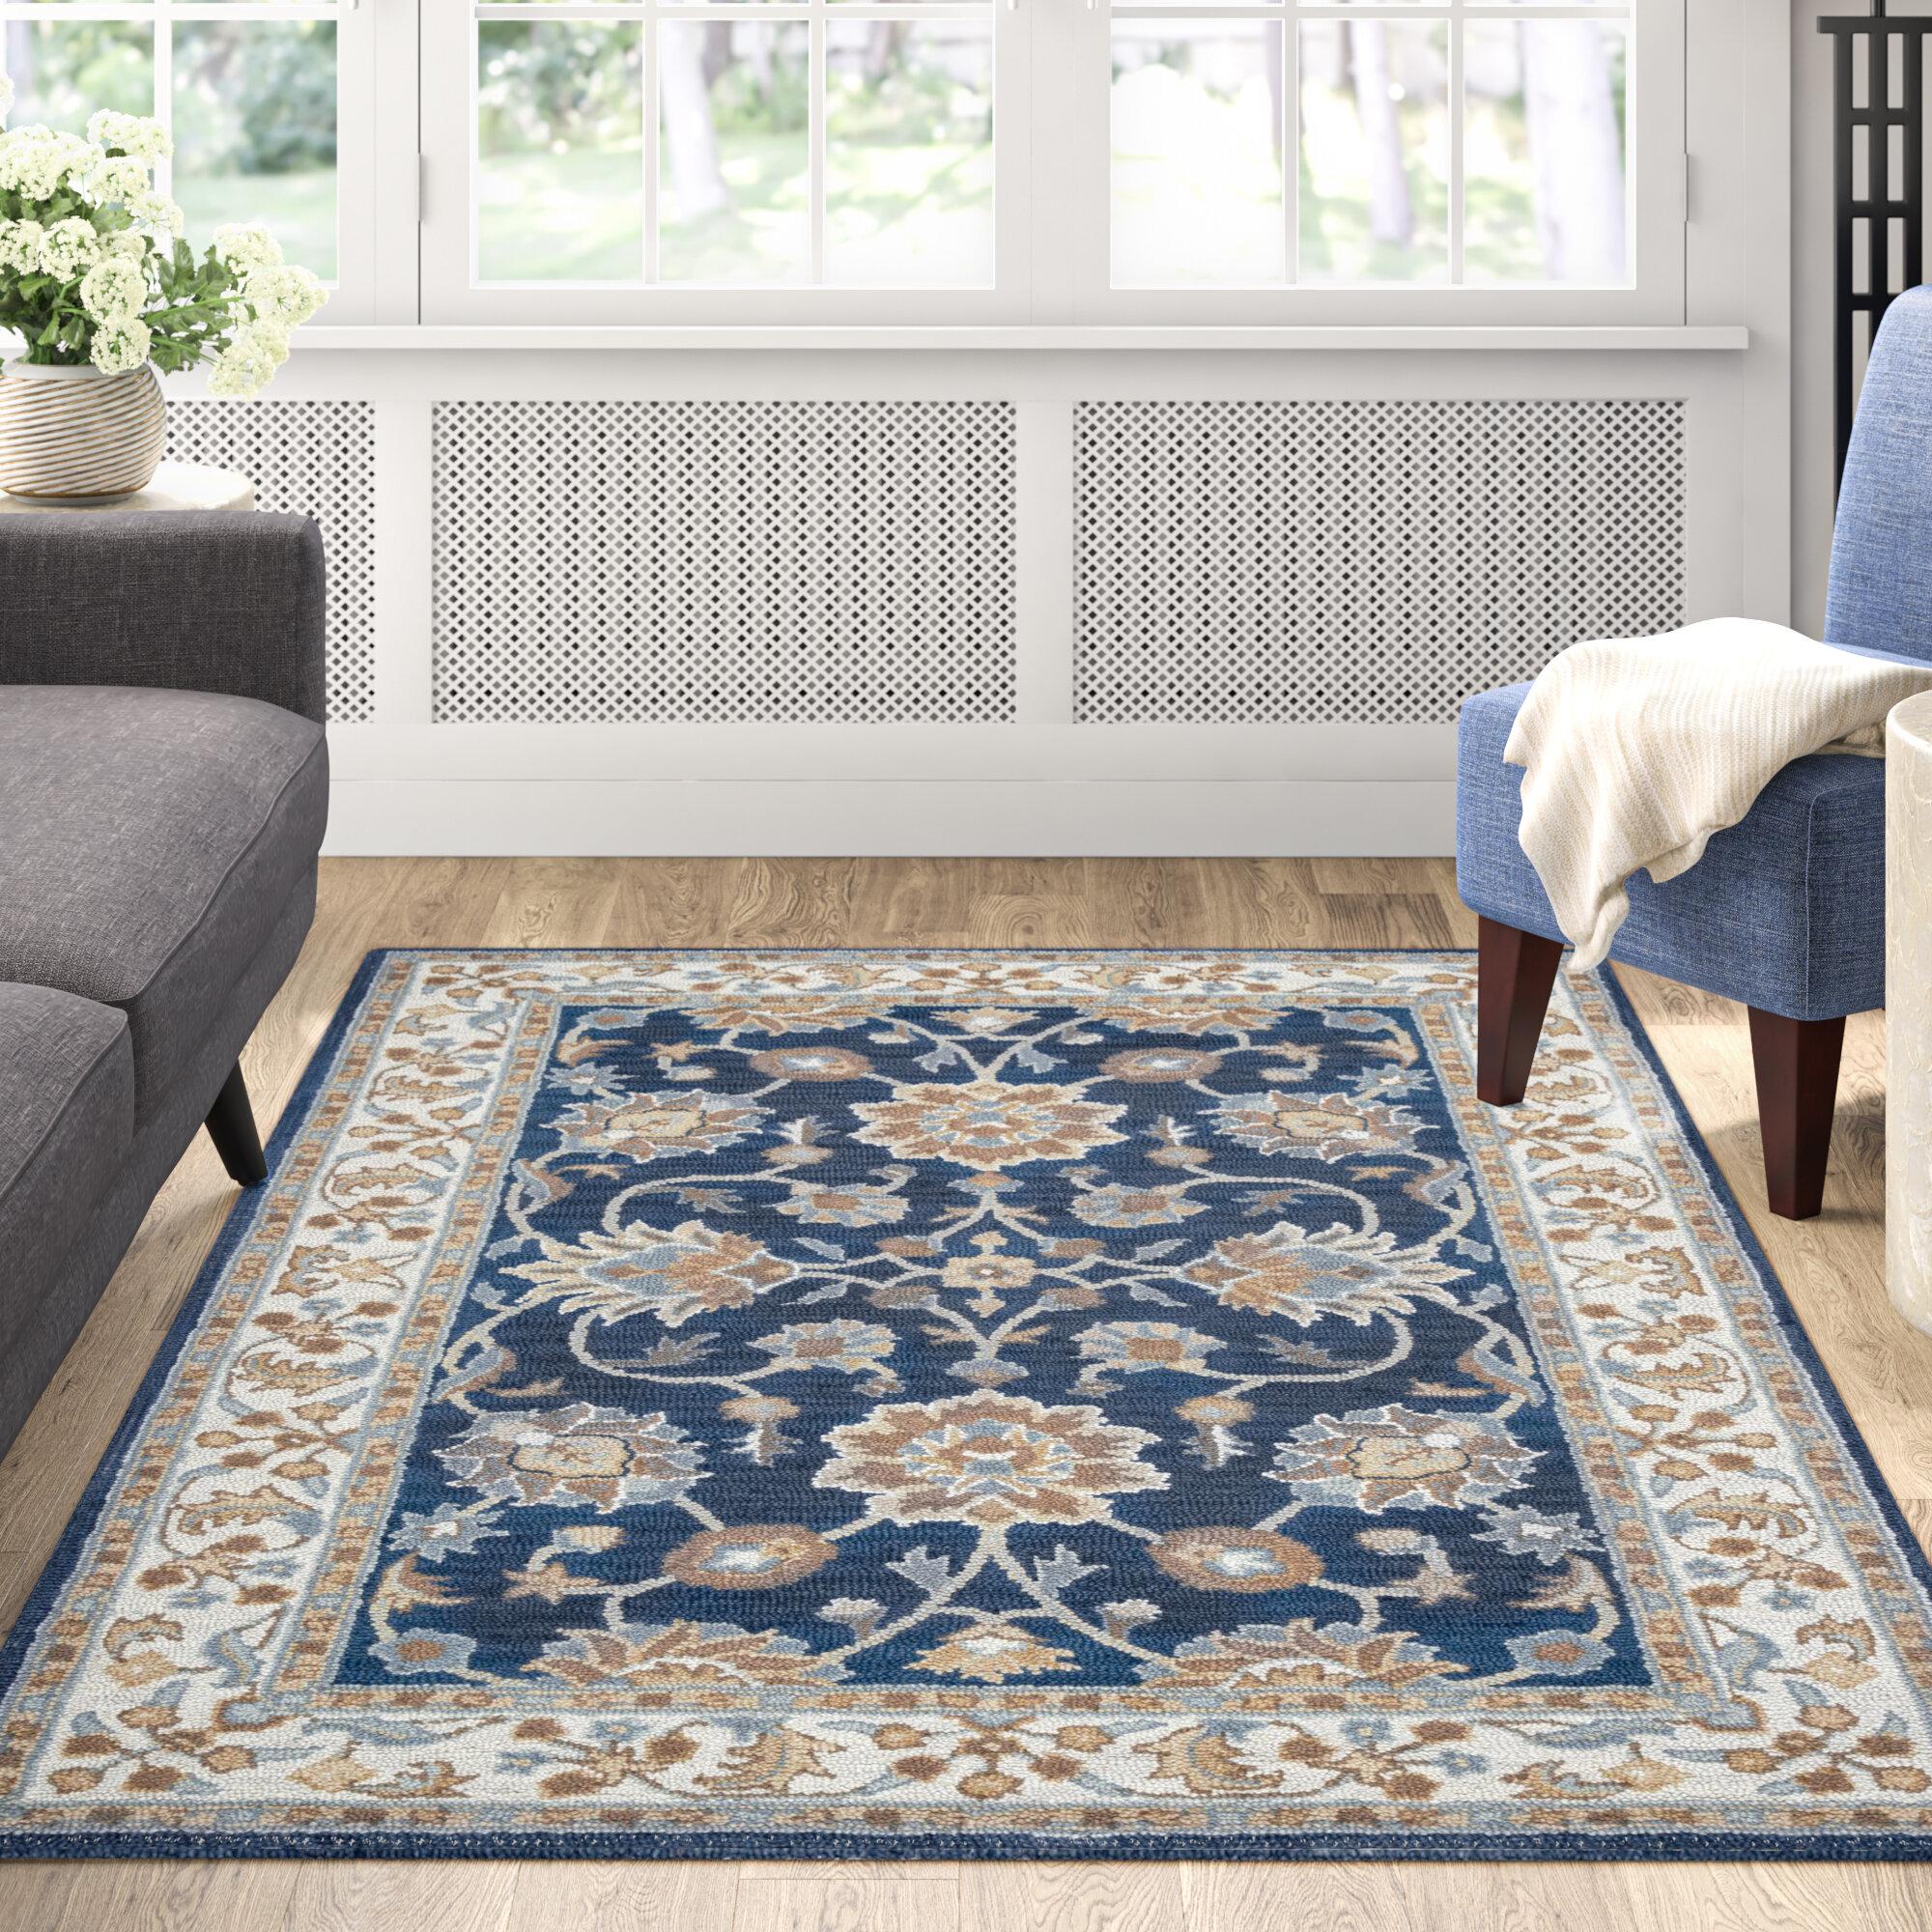 Ilario Oriental Handmade Tufted Wool Blue Area Rug Reviews Birch Lane